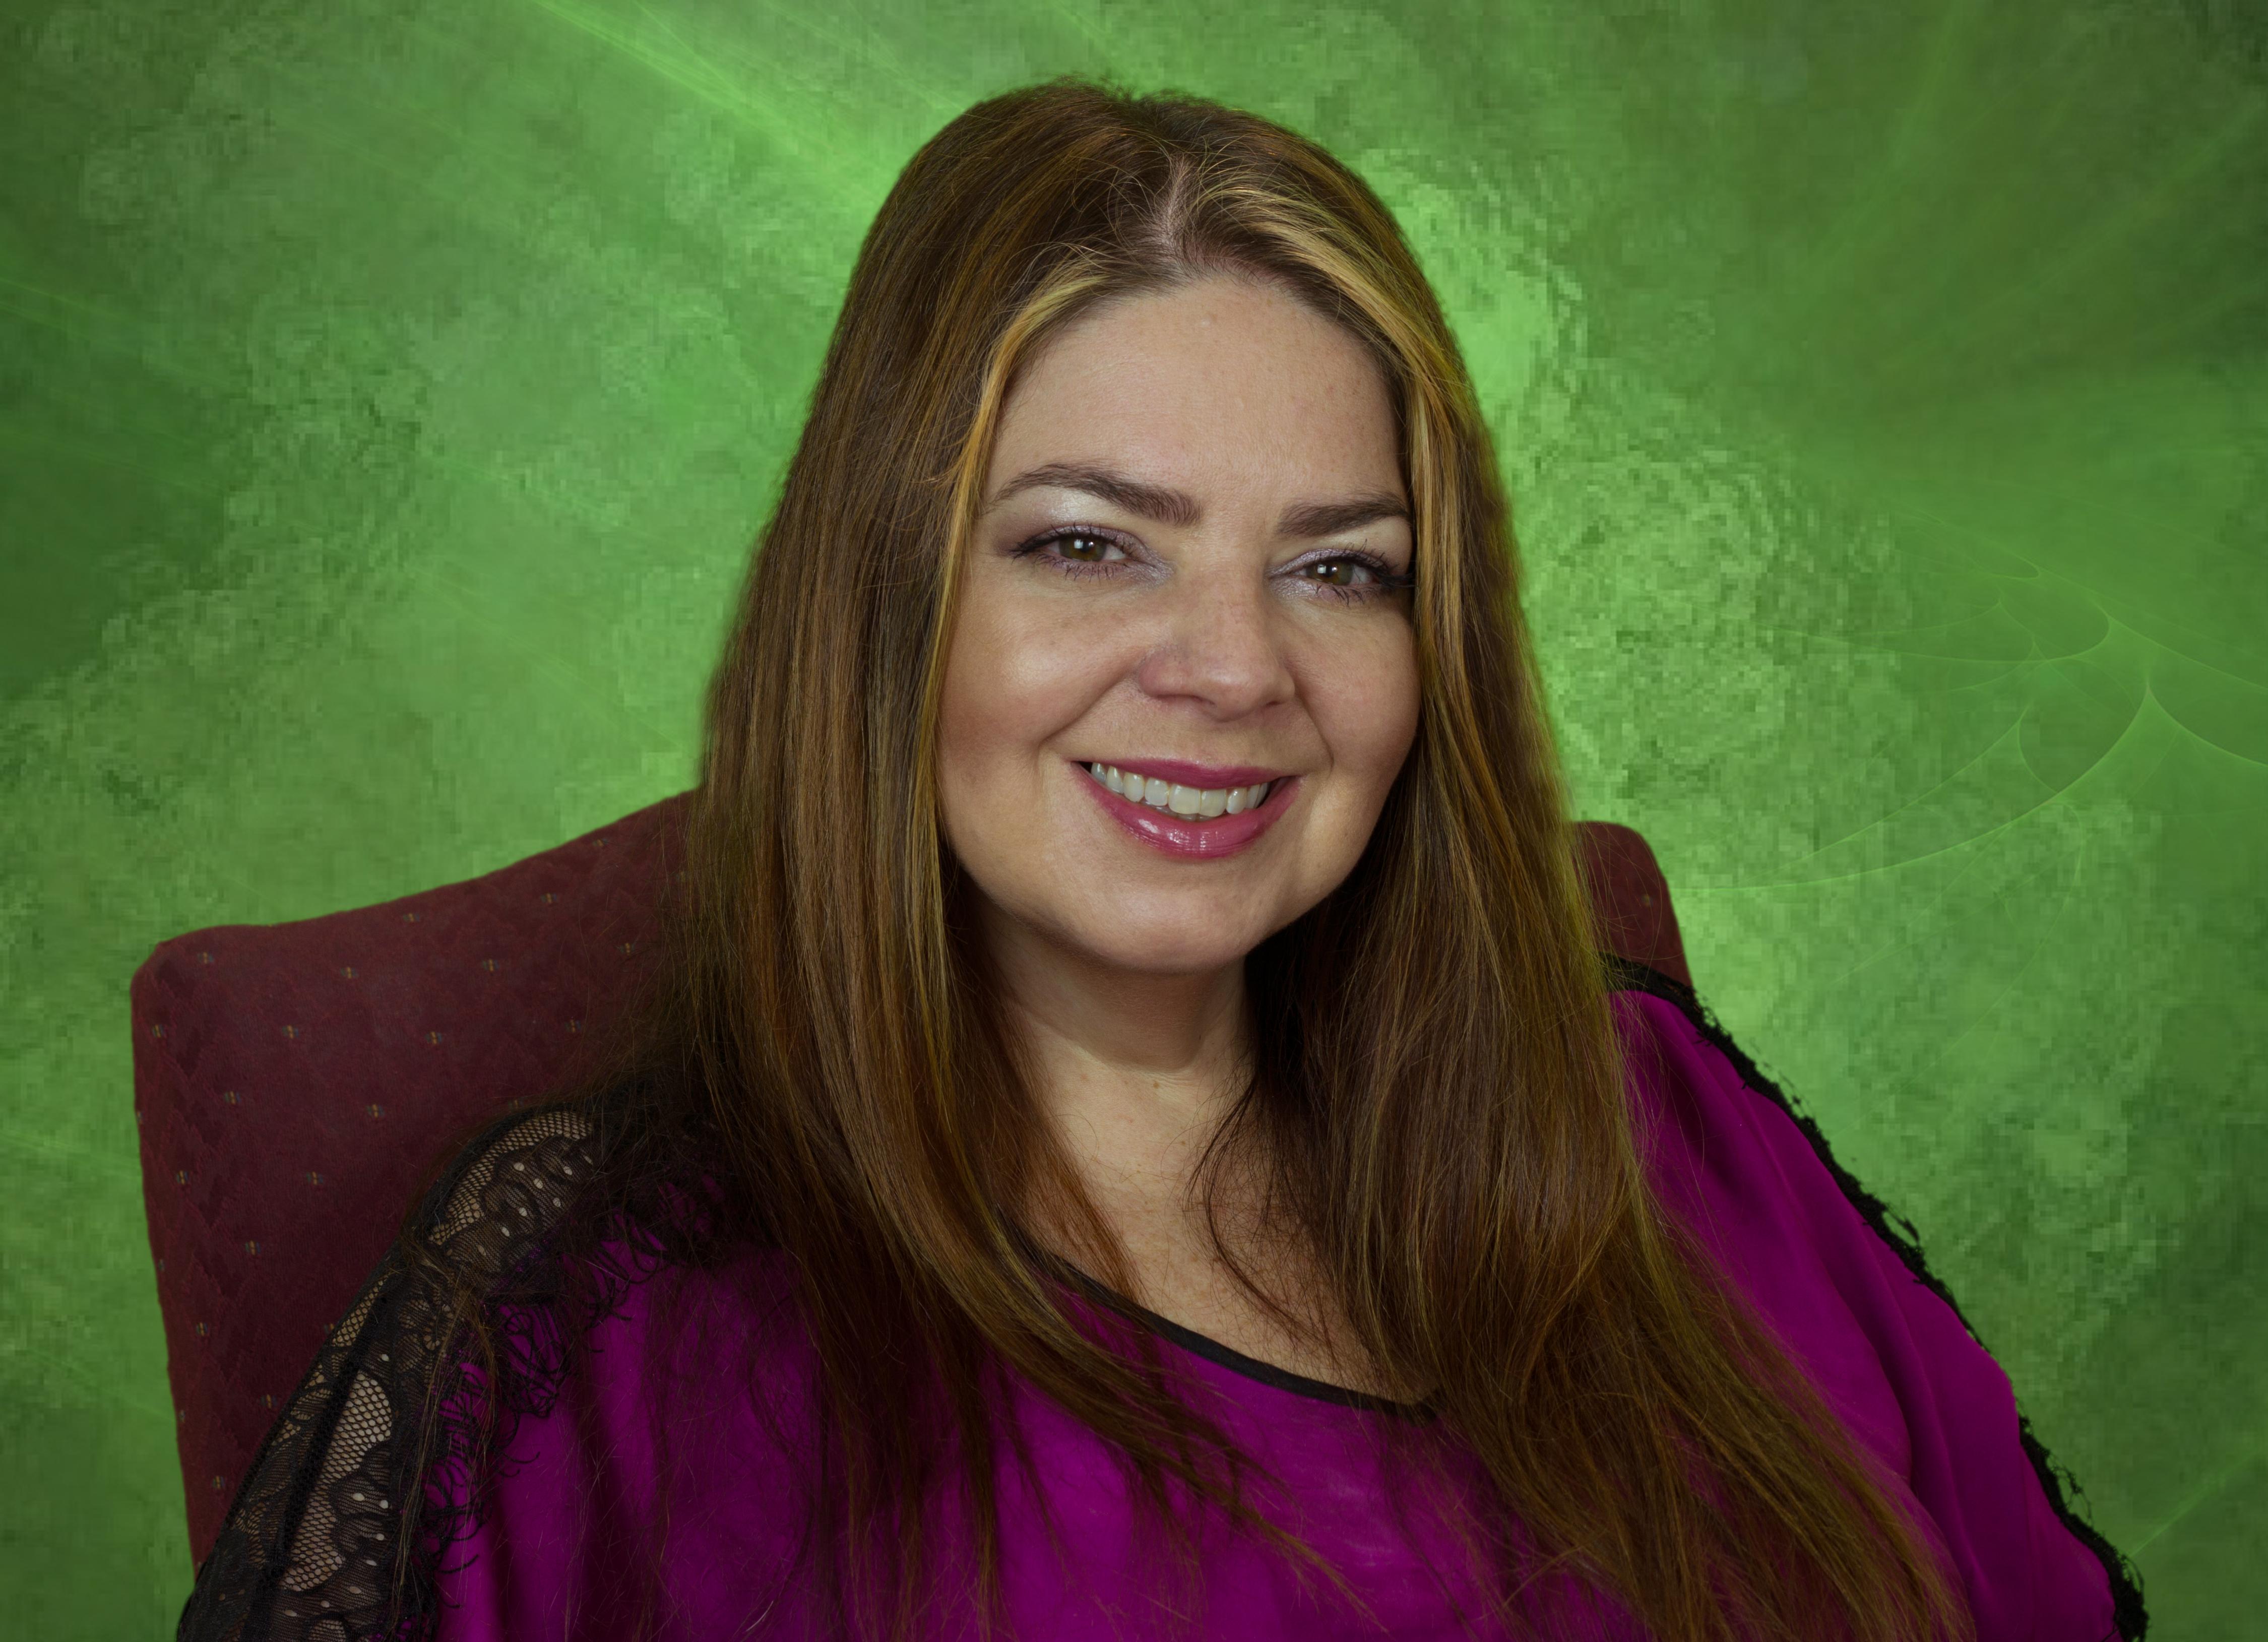 Cynthia Conlin